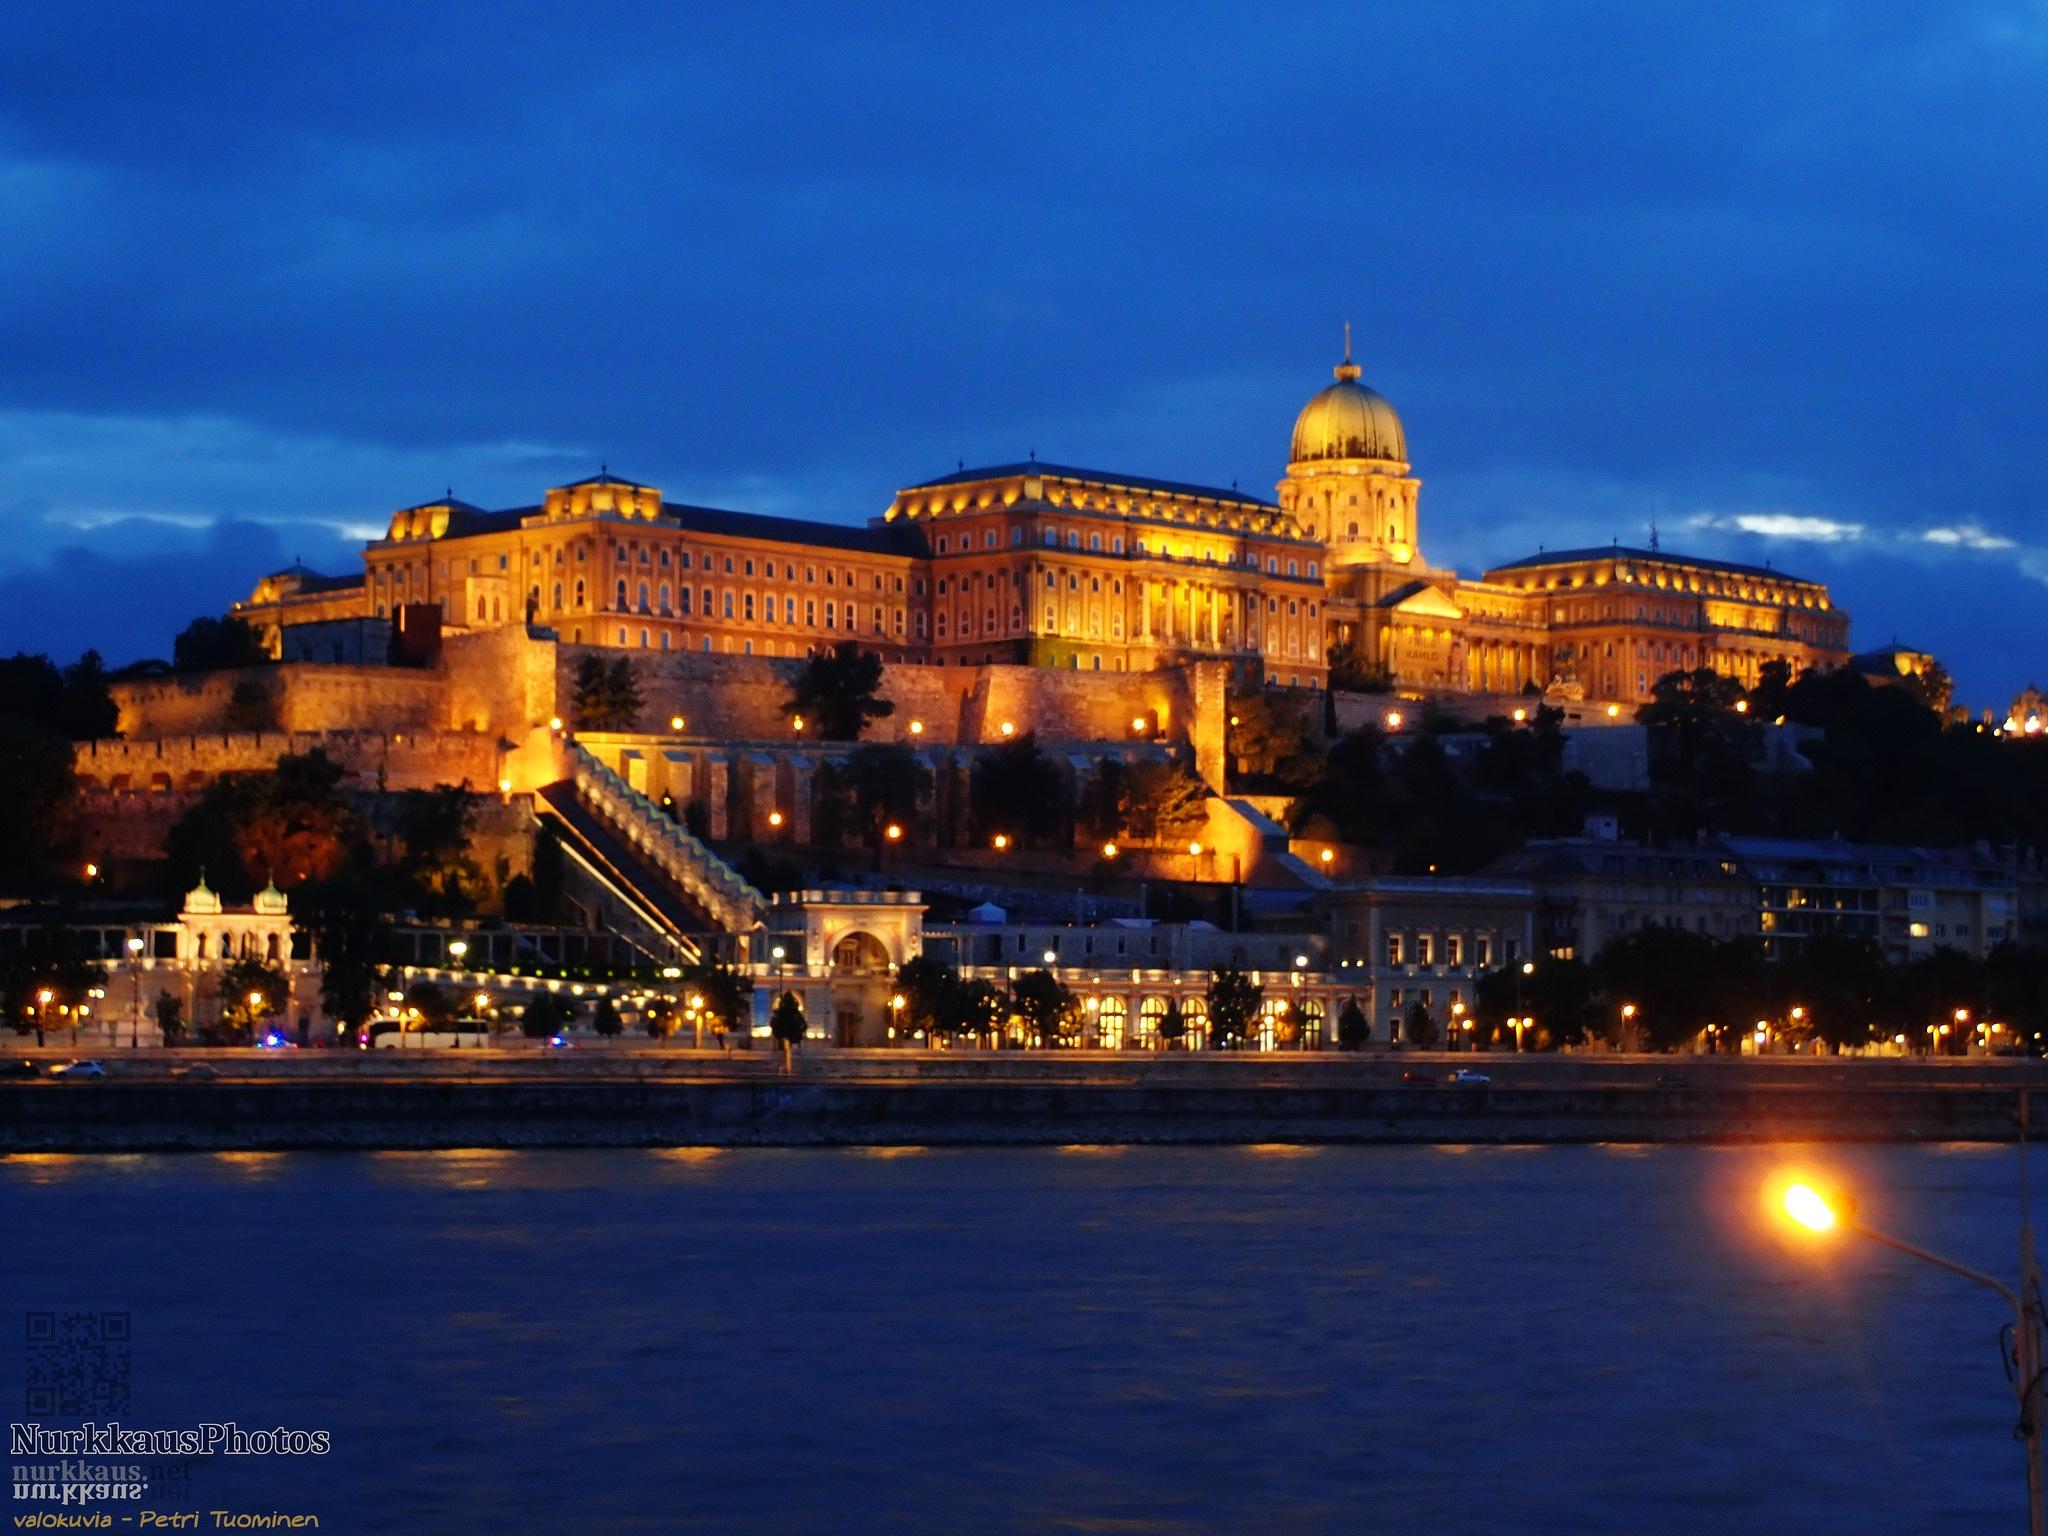 Buda castle by PeepeT